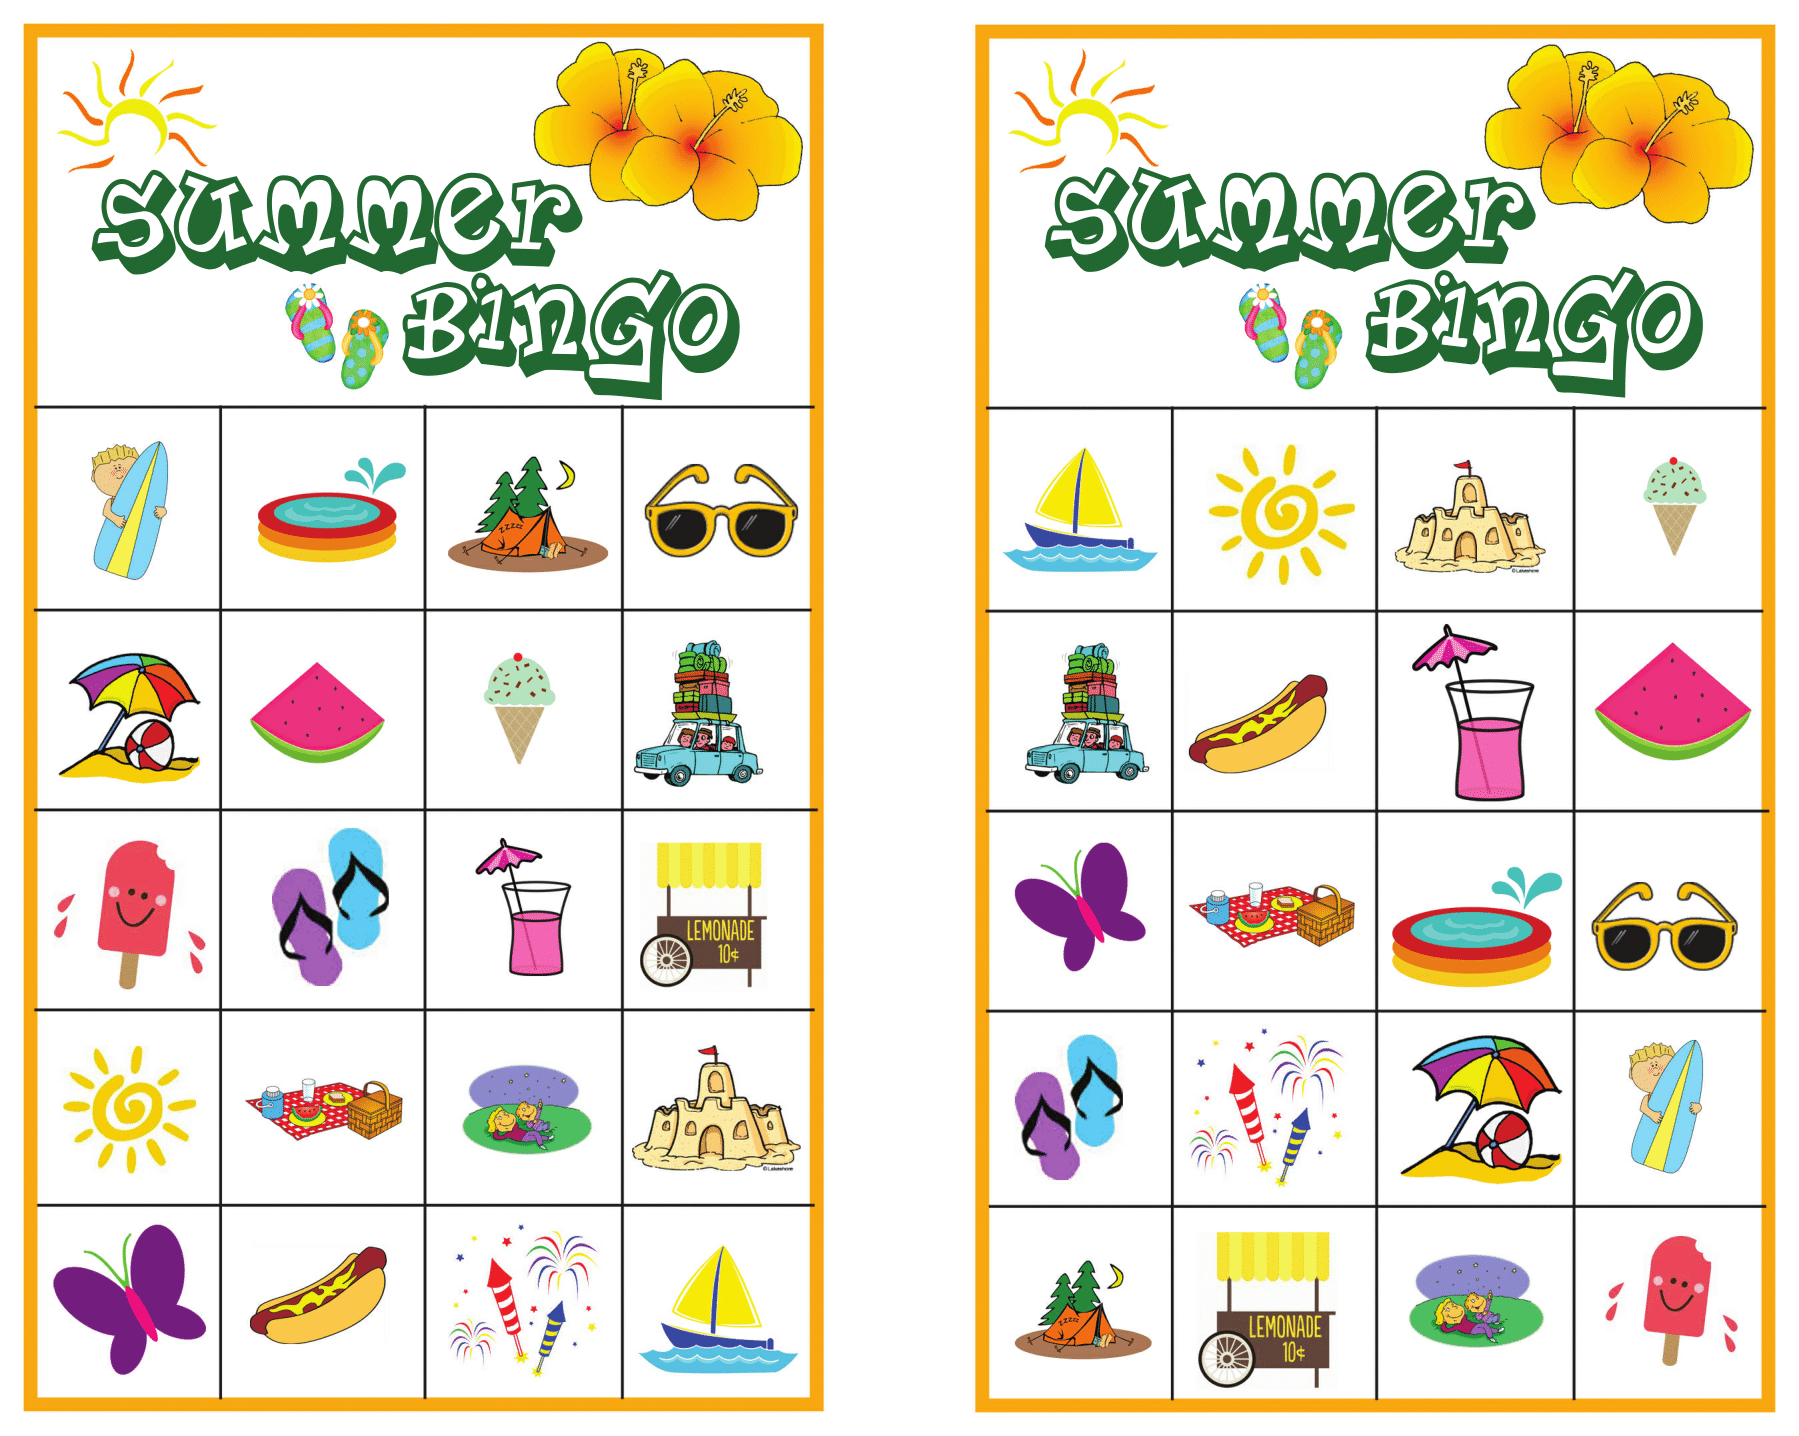 Summer Bingo Page 3 - Free Summer Printable